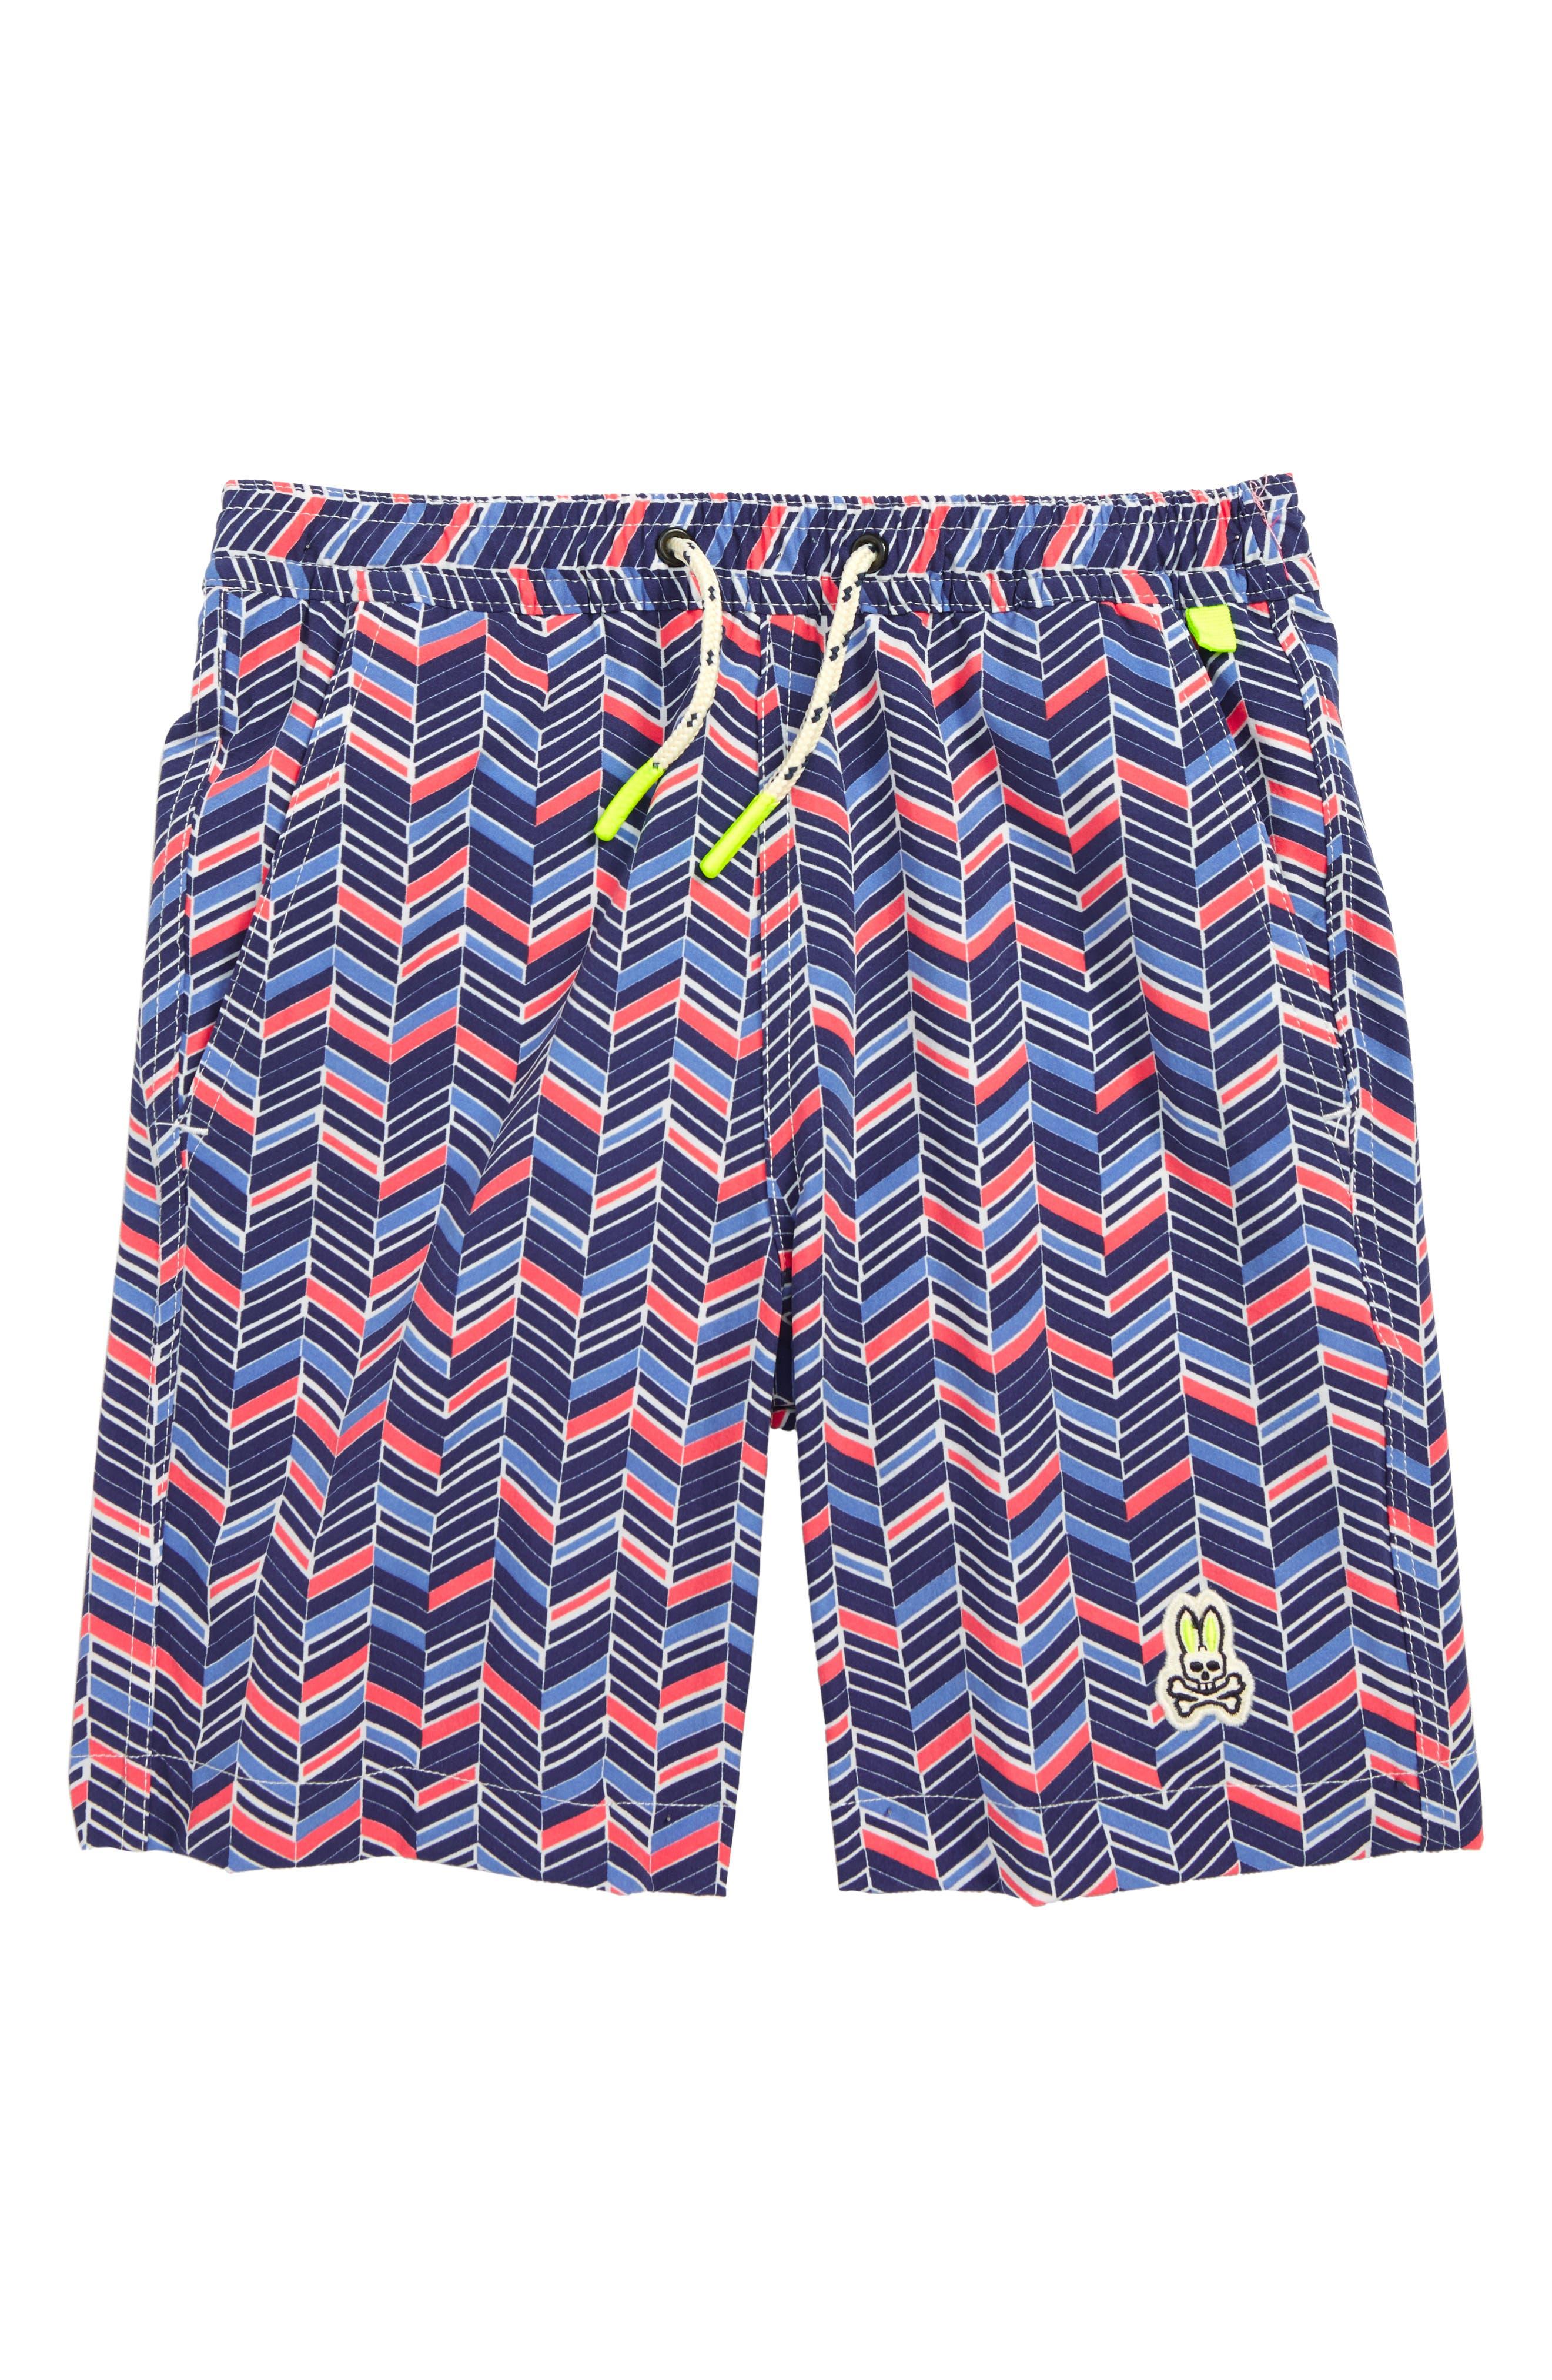 Swim Trunks,                         Main,                         color, BLUE PRINT